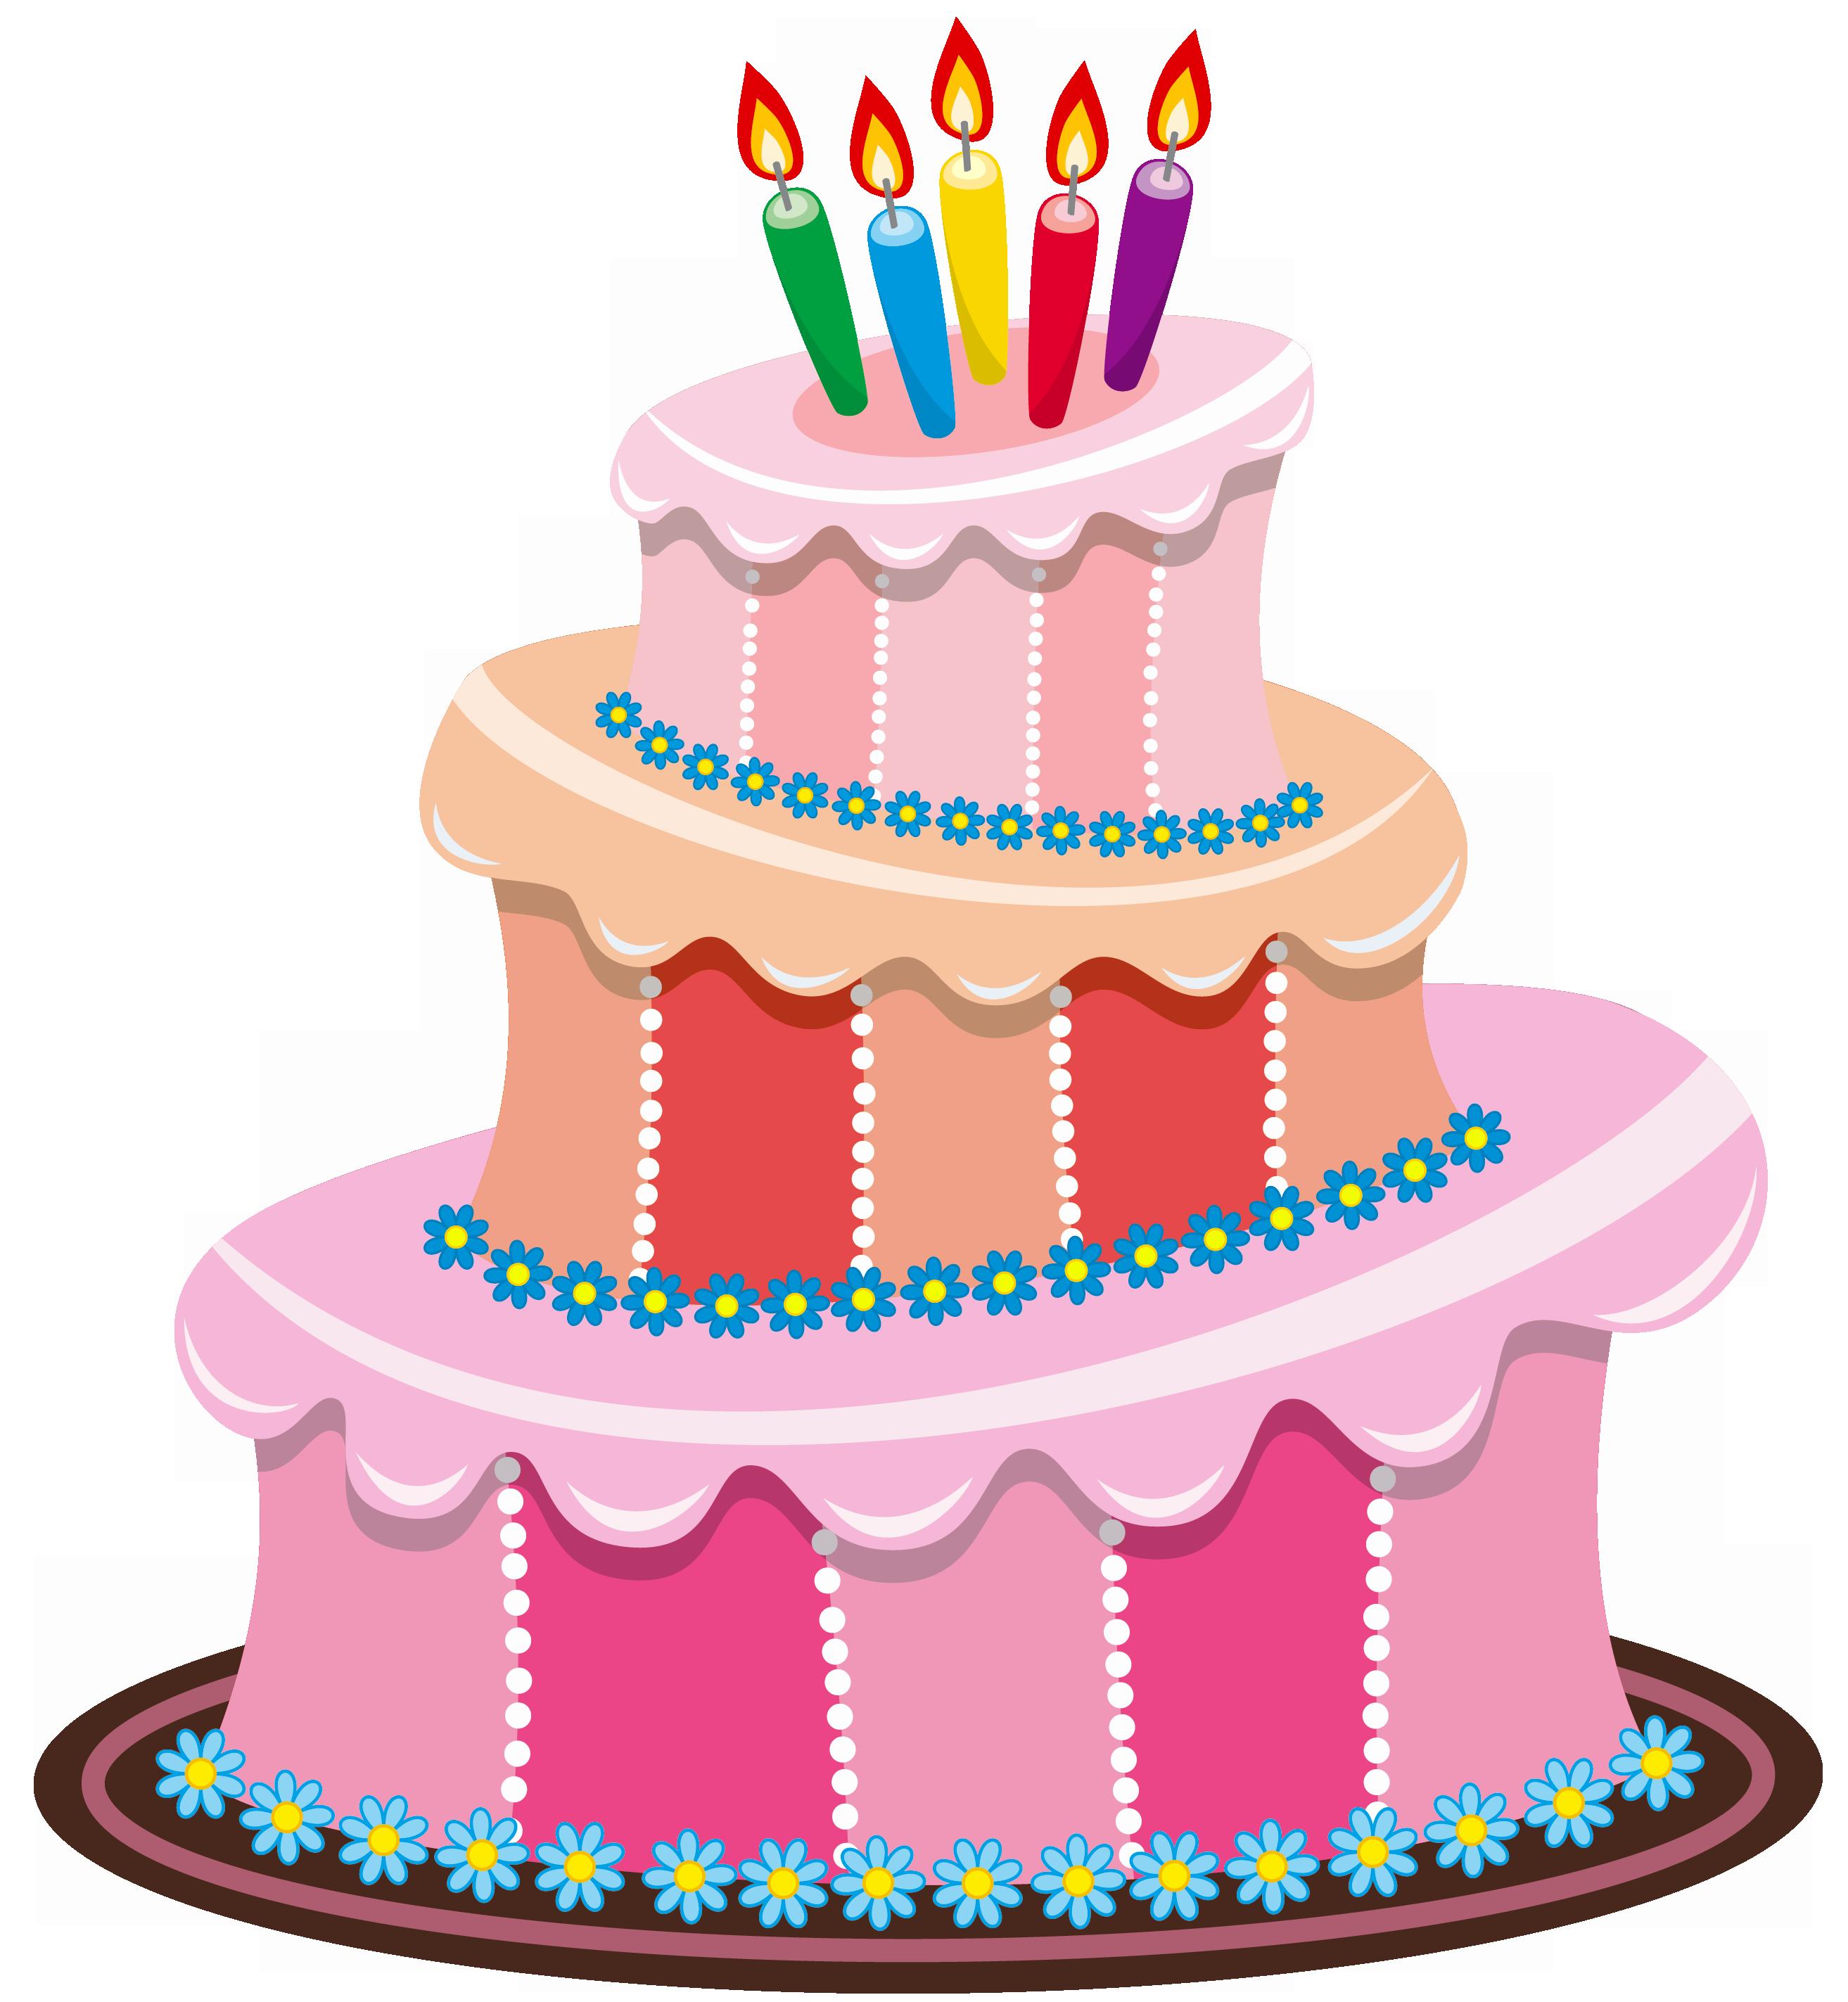 Birthday Cake Png Birthday Cake Clipart Free Download Free Transparent Png Logos